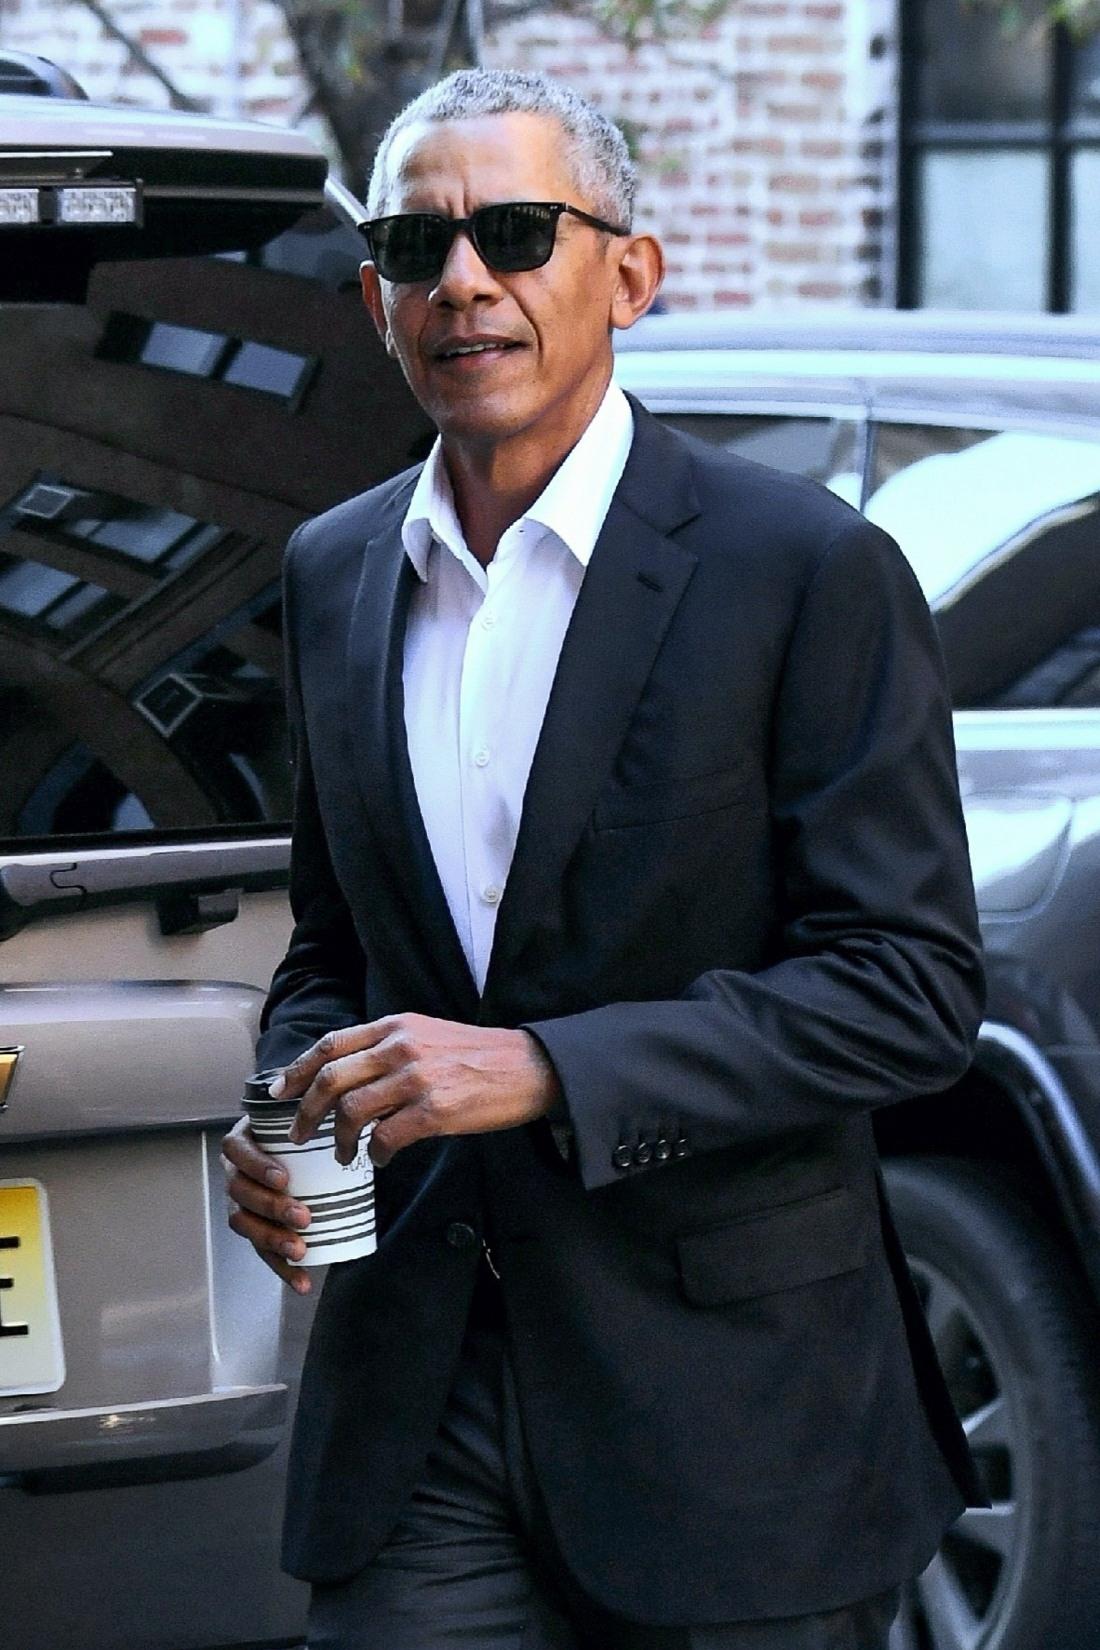 Barack Obama greets the media in NYC